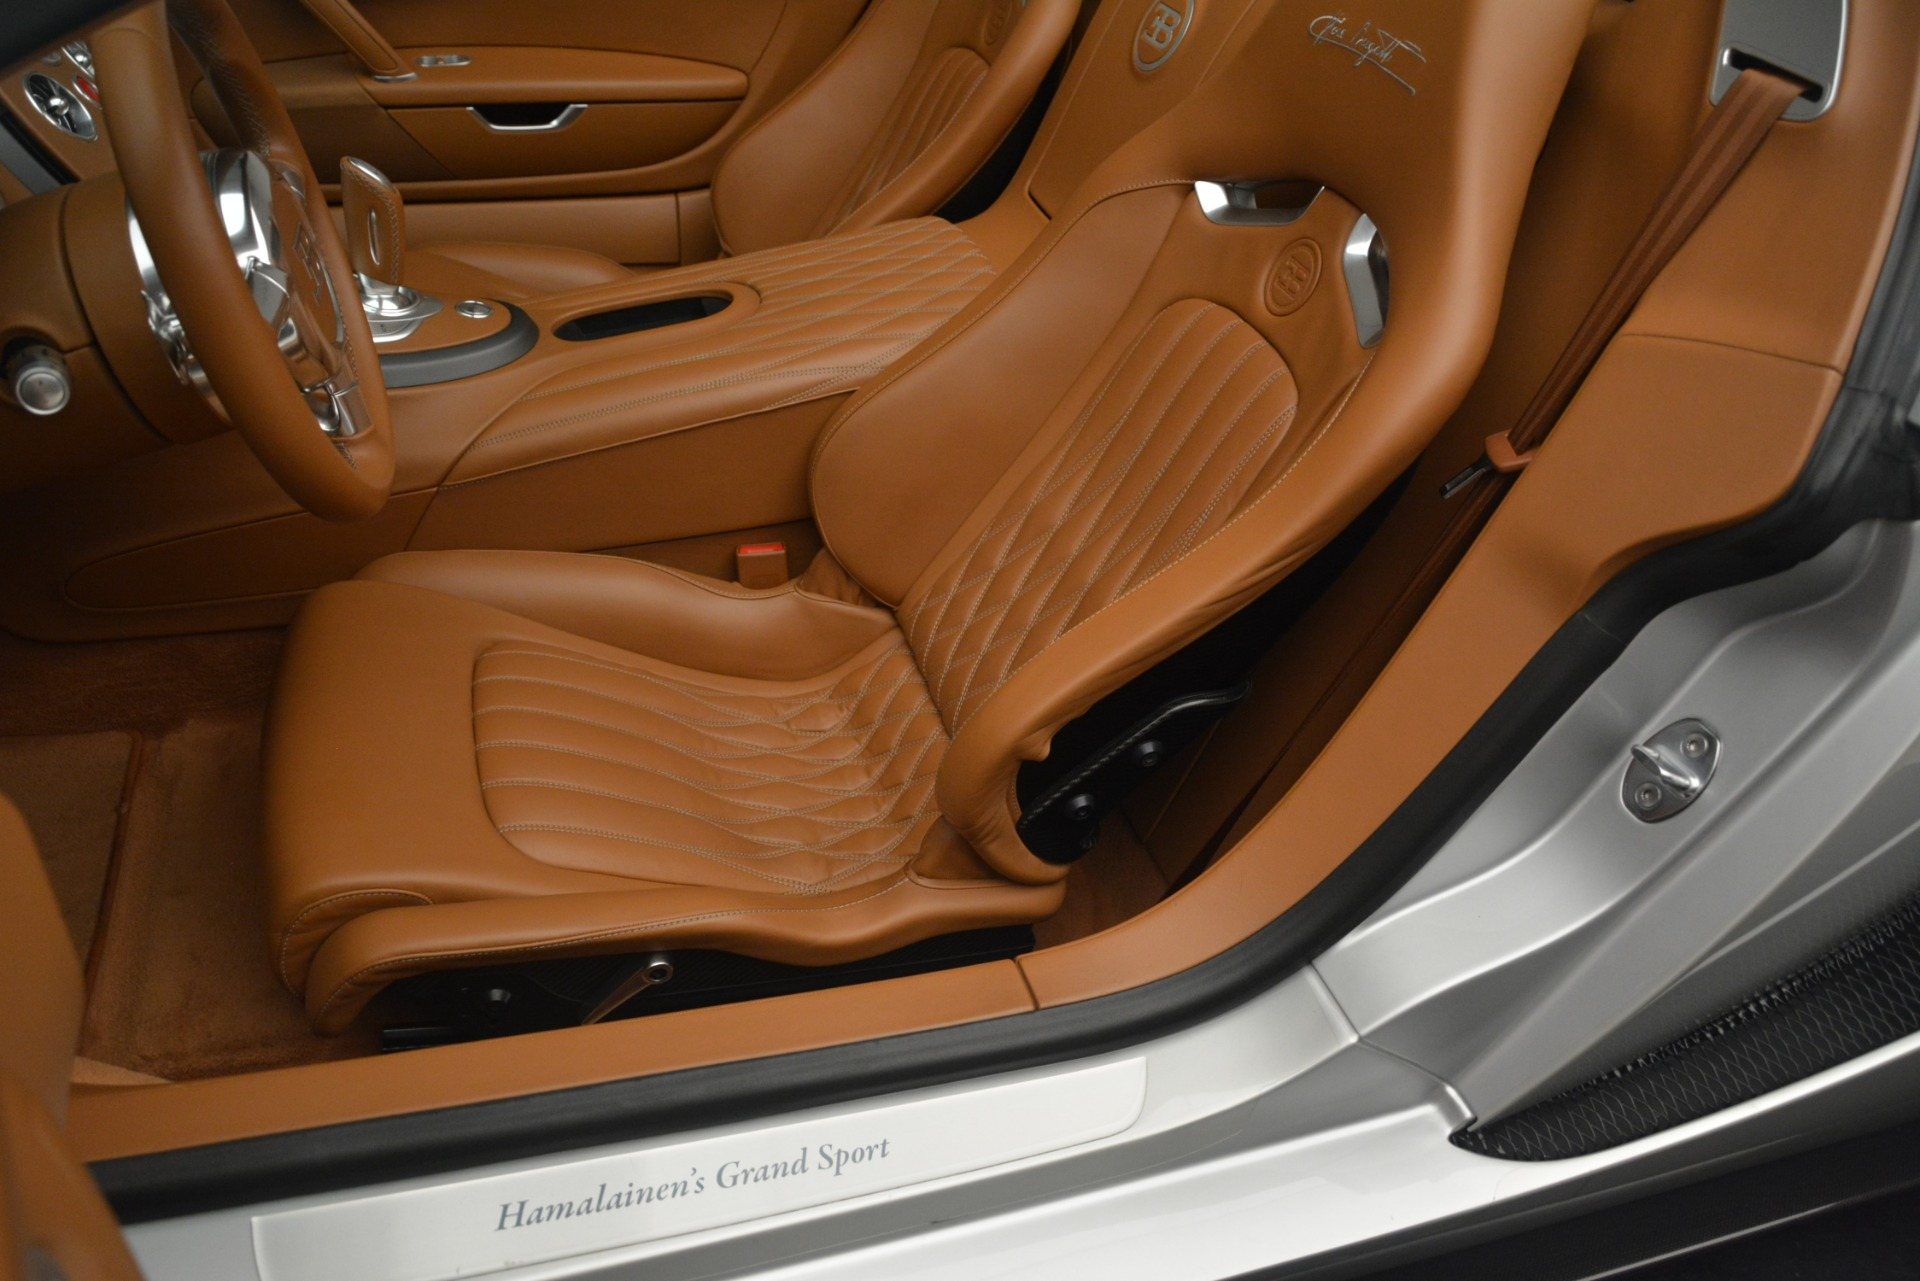 Used 2010 Bugatti Veyron 16.4 Grand Sport For Sale In Greenwich, CT 3159_p25